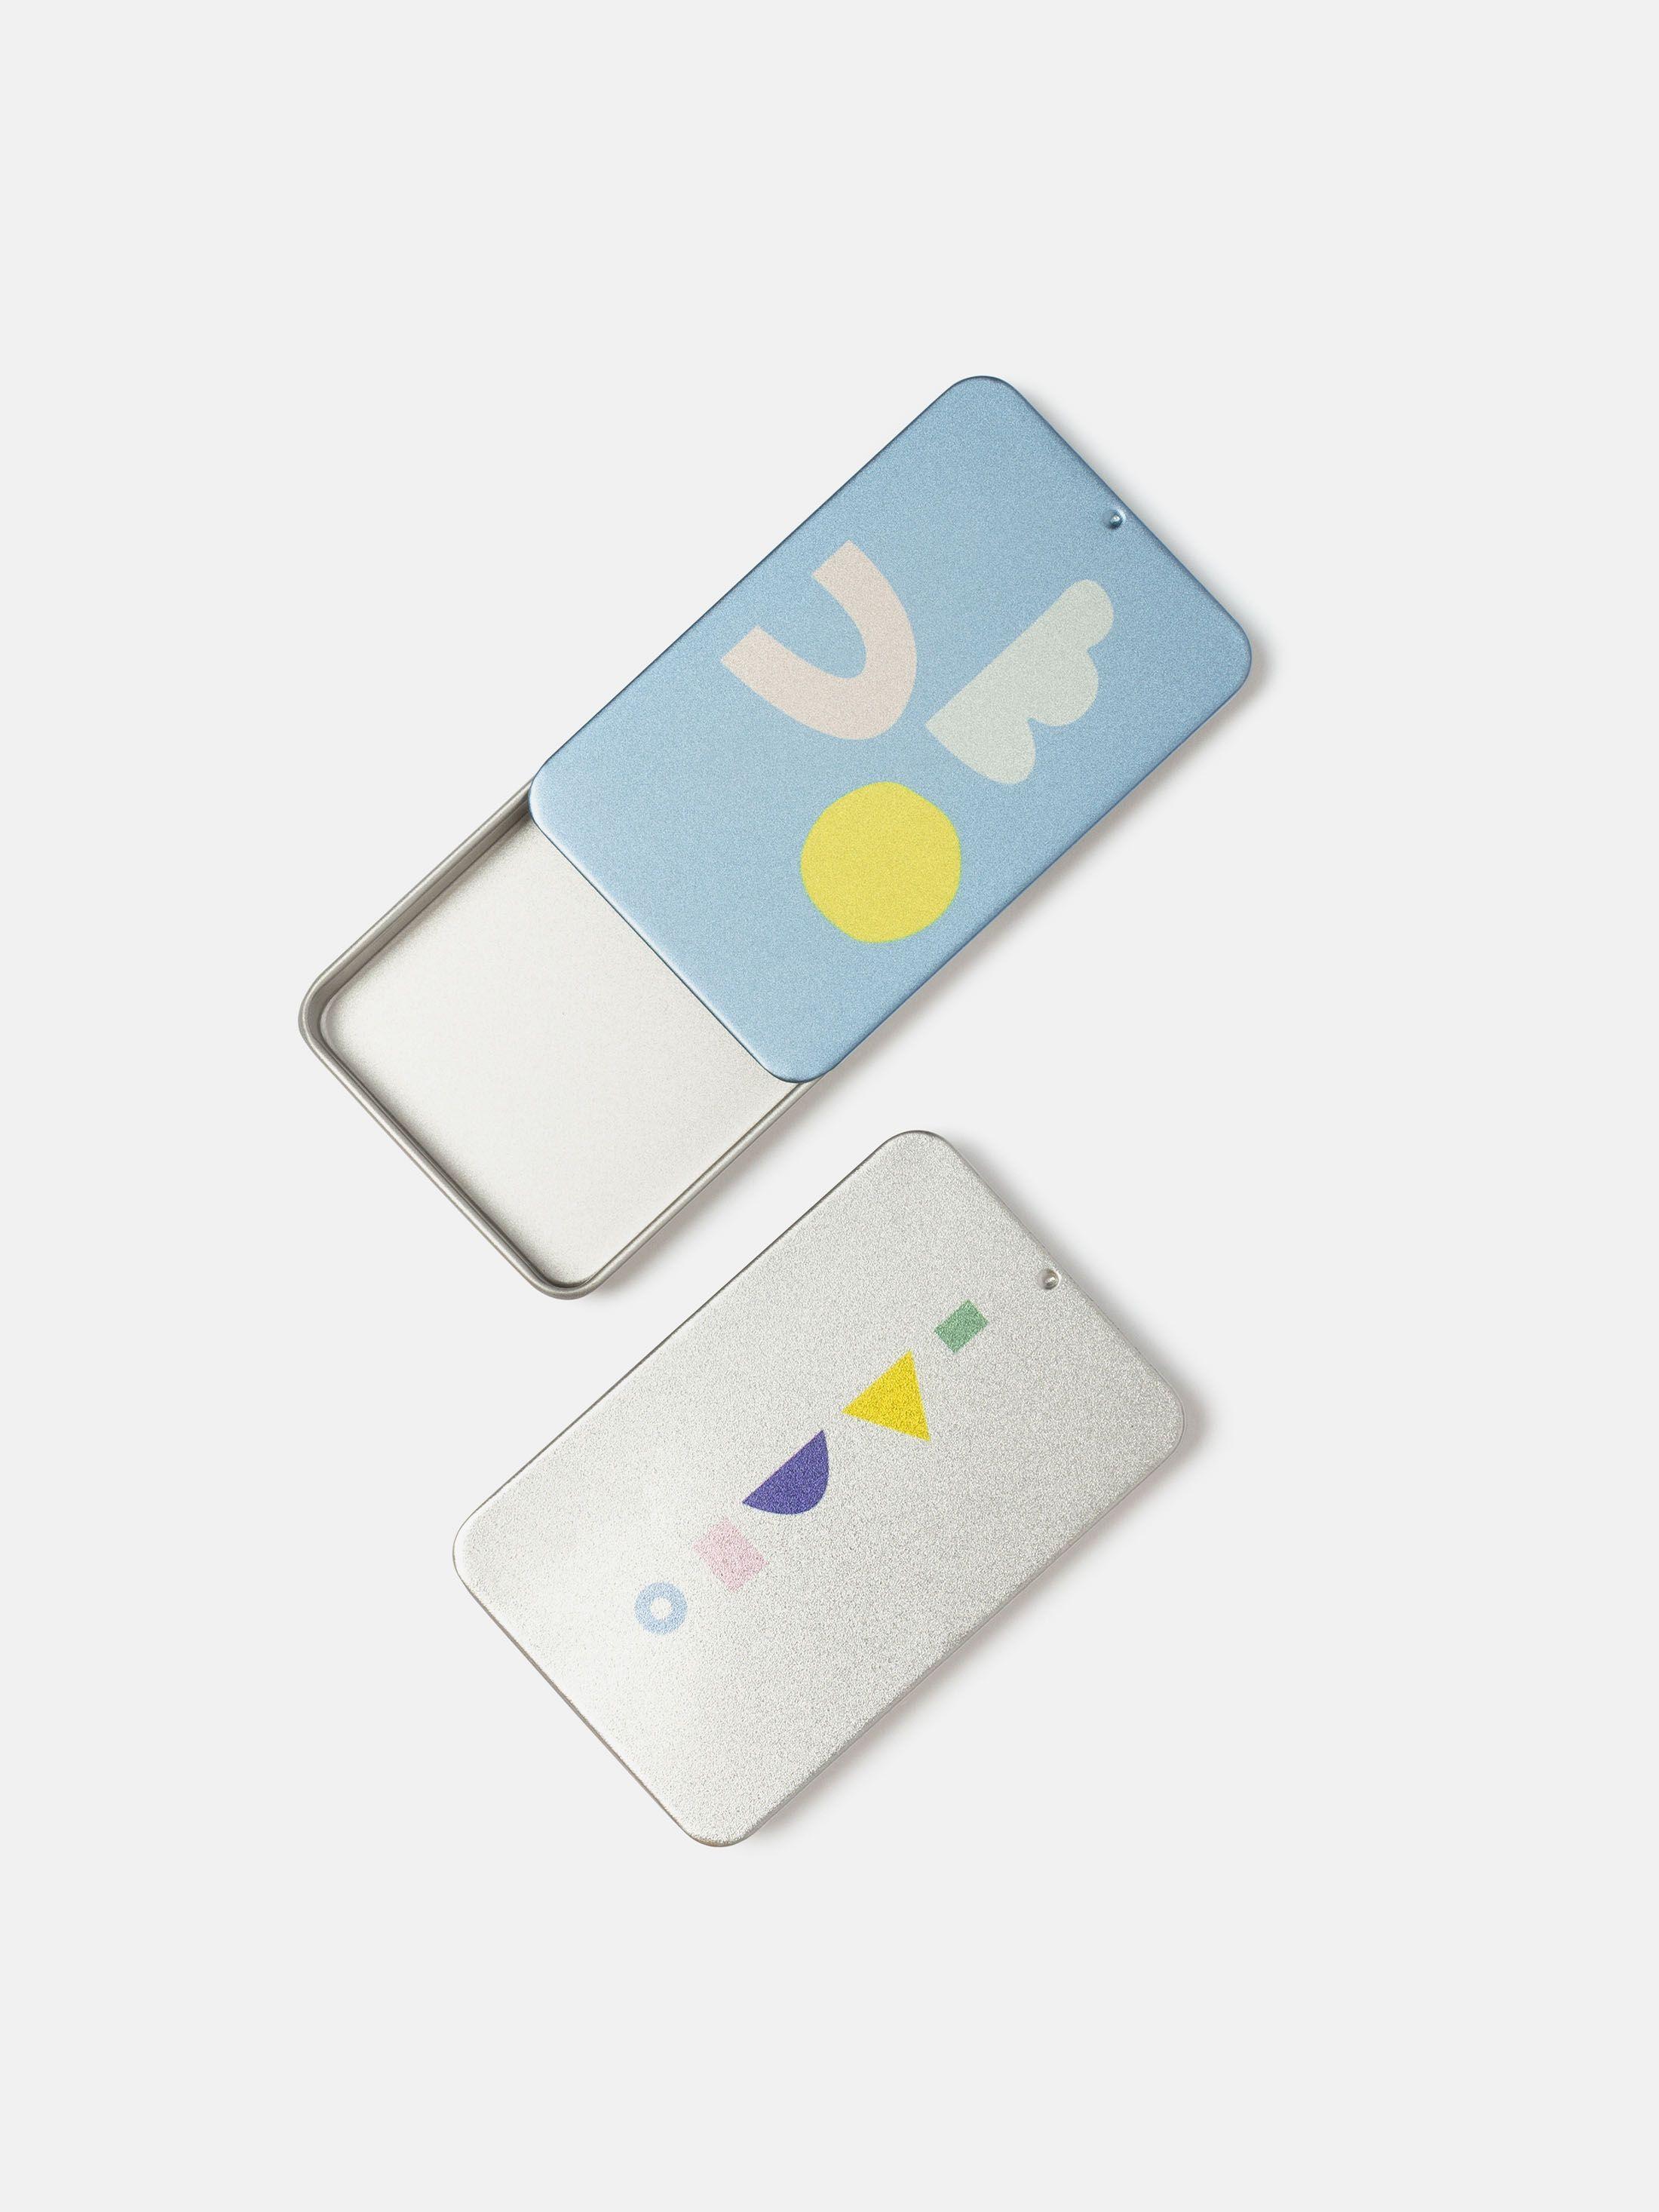 Buisness card holder